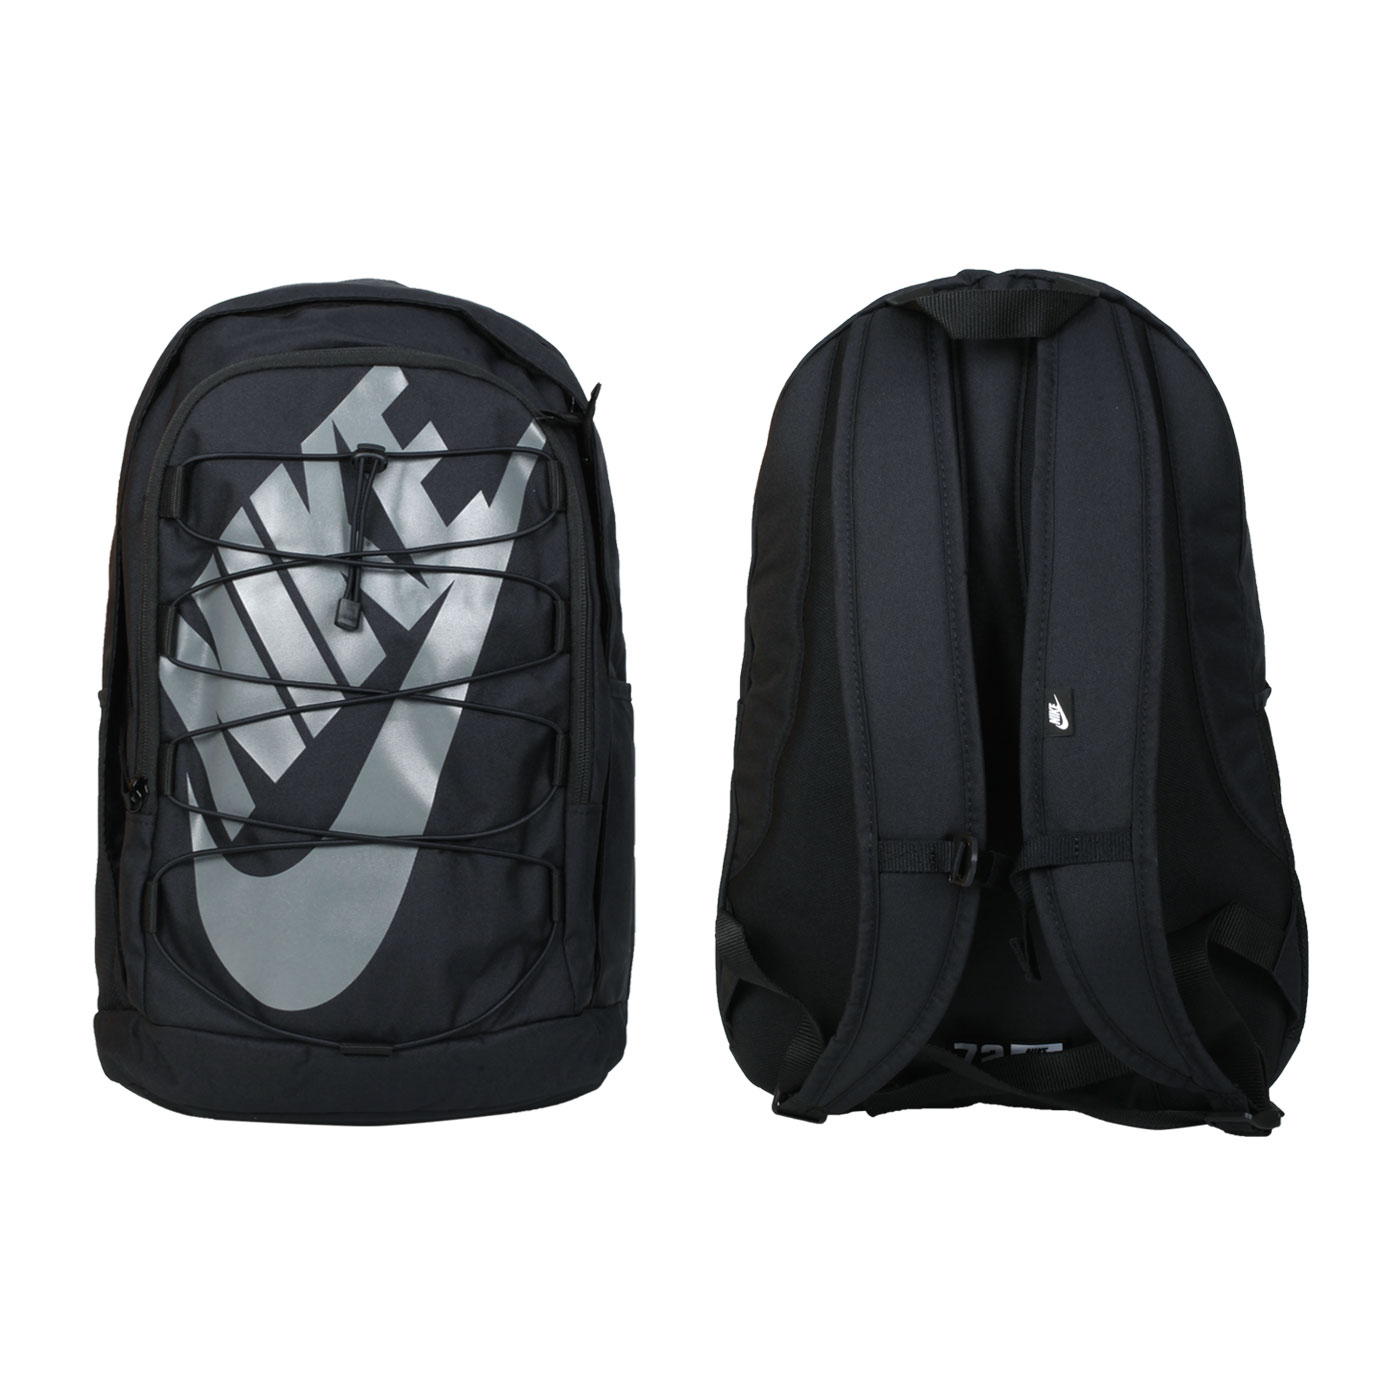 NIKE 大型後背包 BA5883-015 - 黑灰